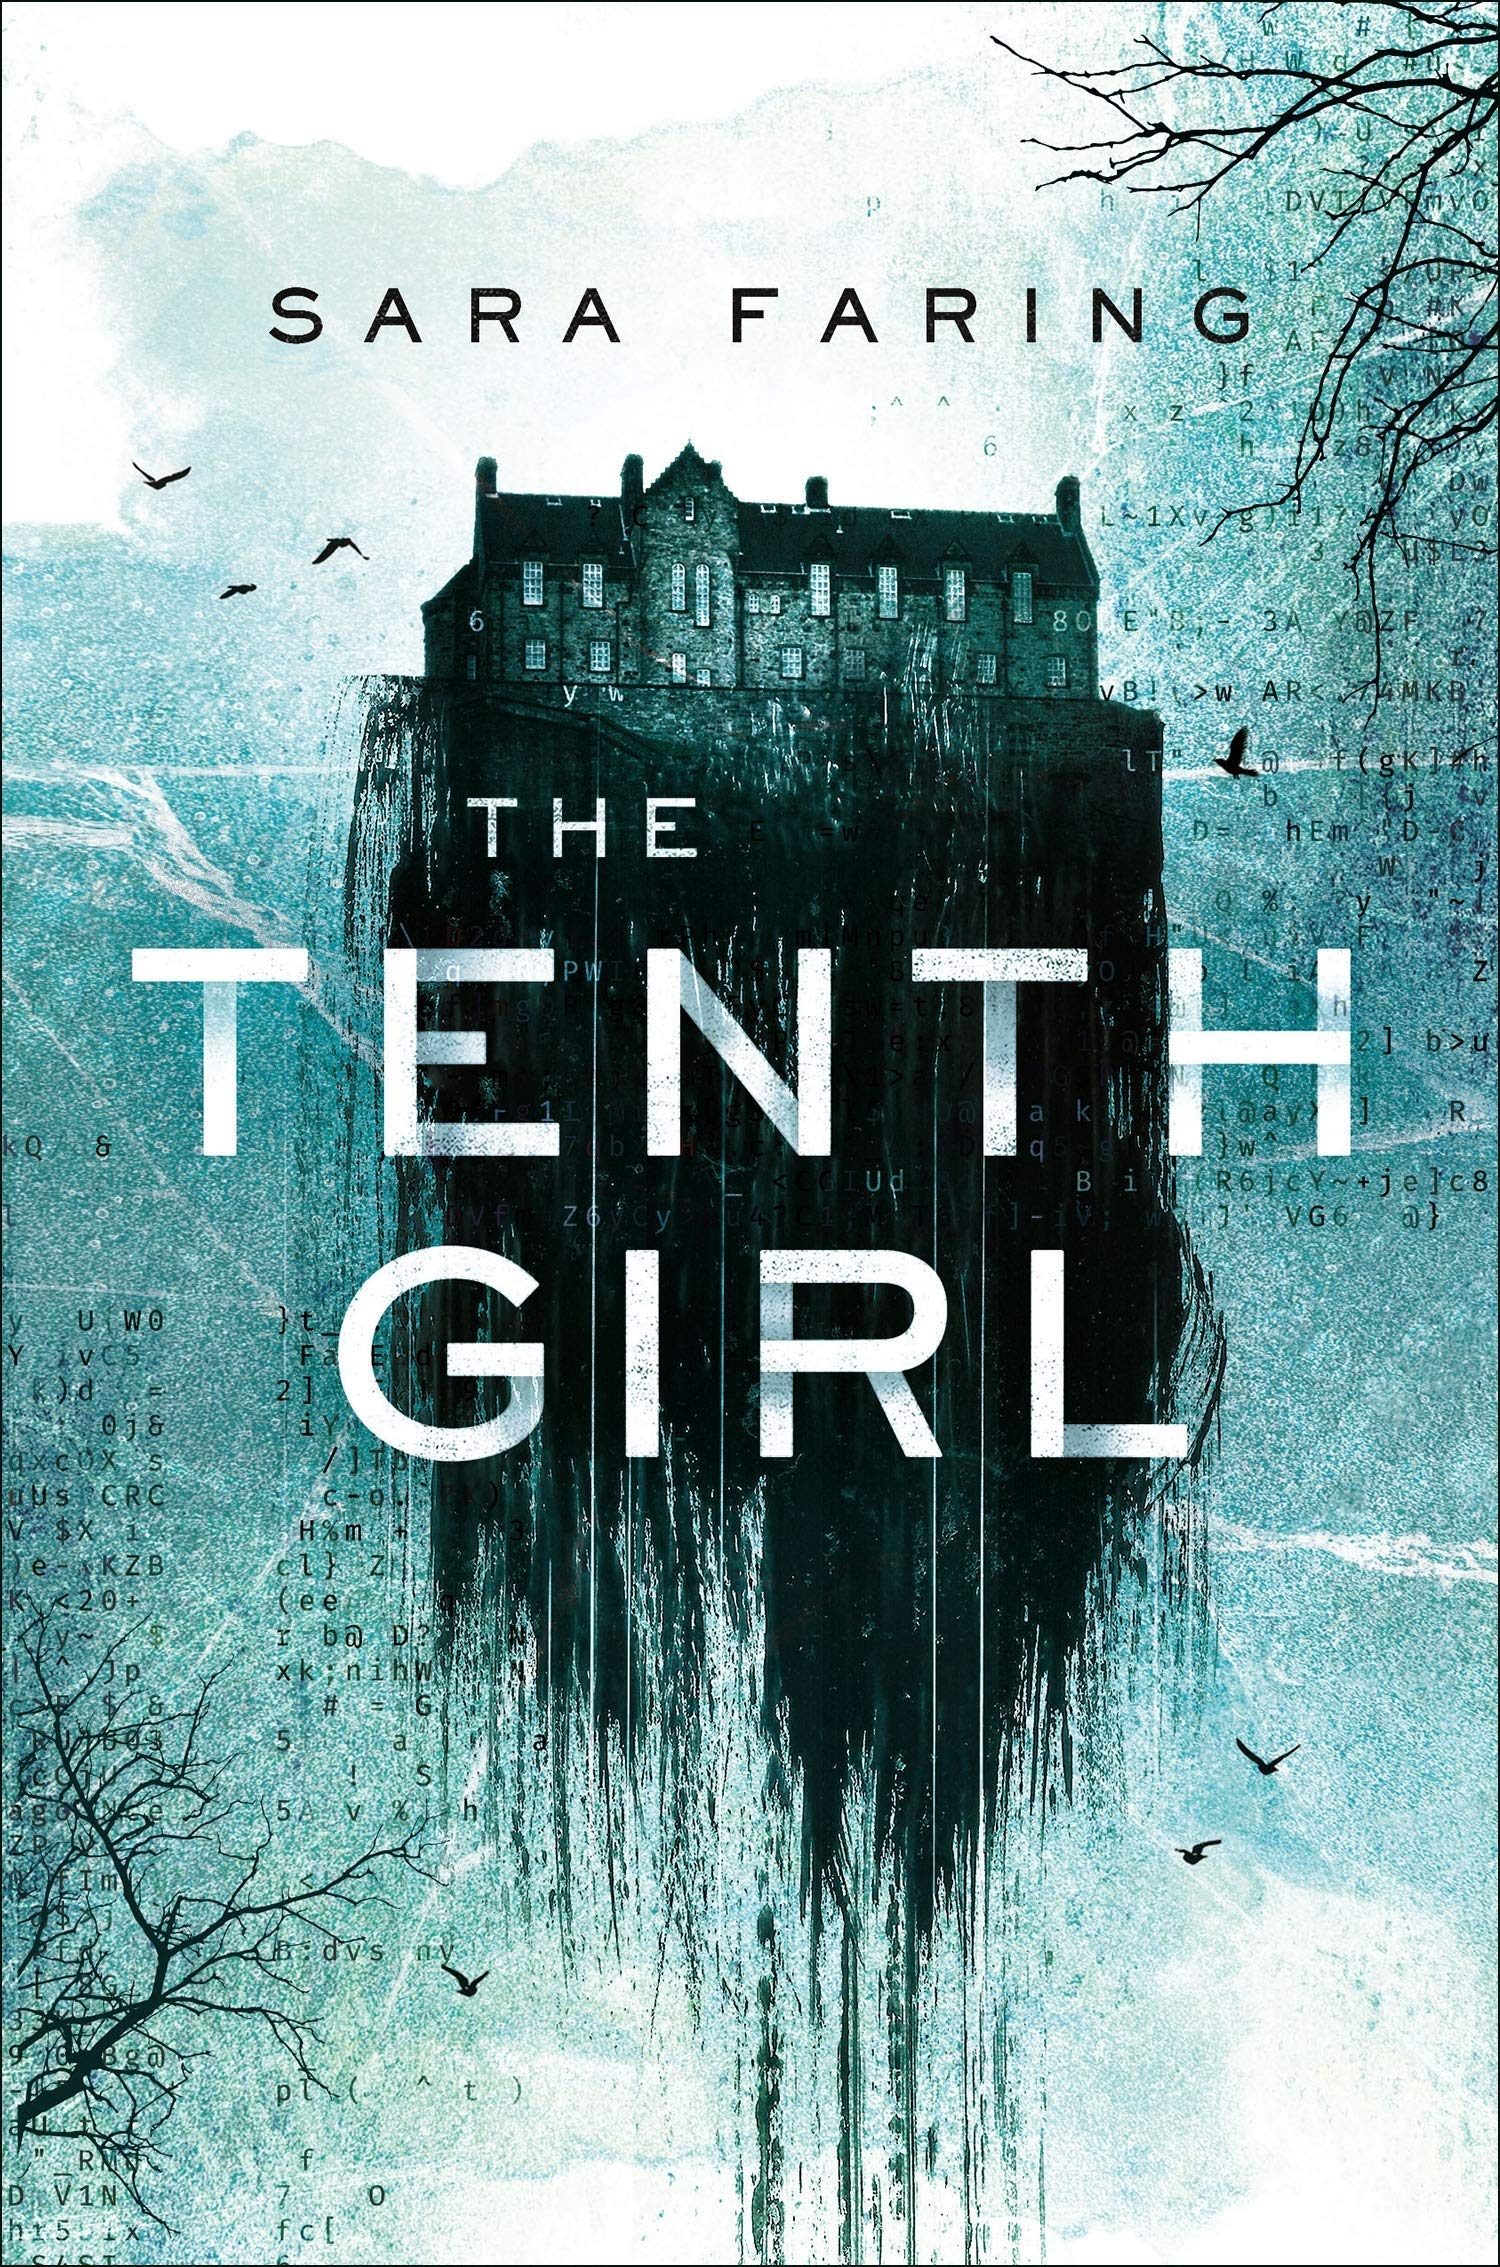 Amazon.com: The Tenth Girl: 9781250304506: Faring, Sara: Books